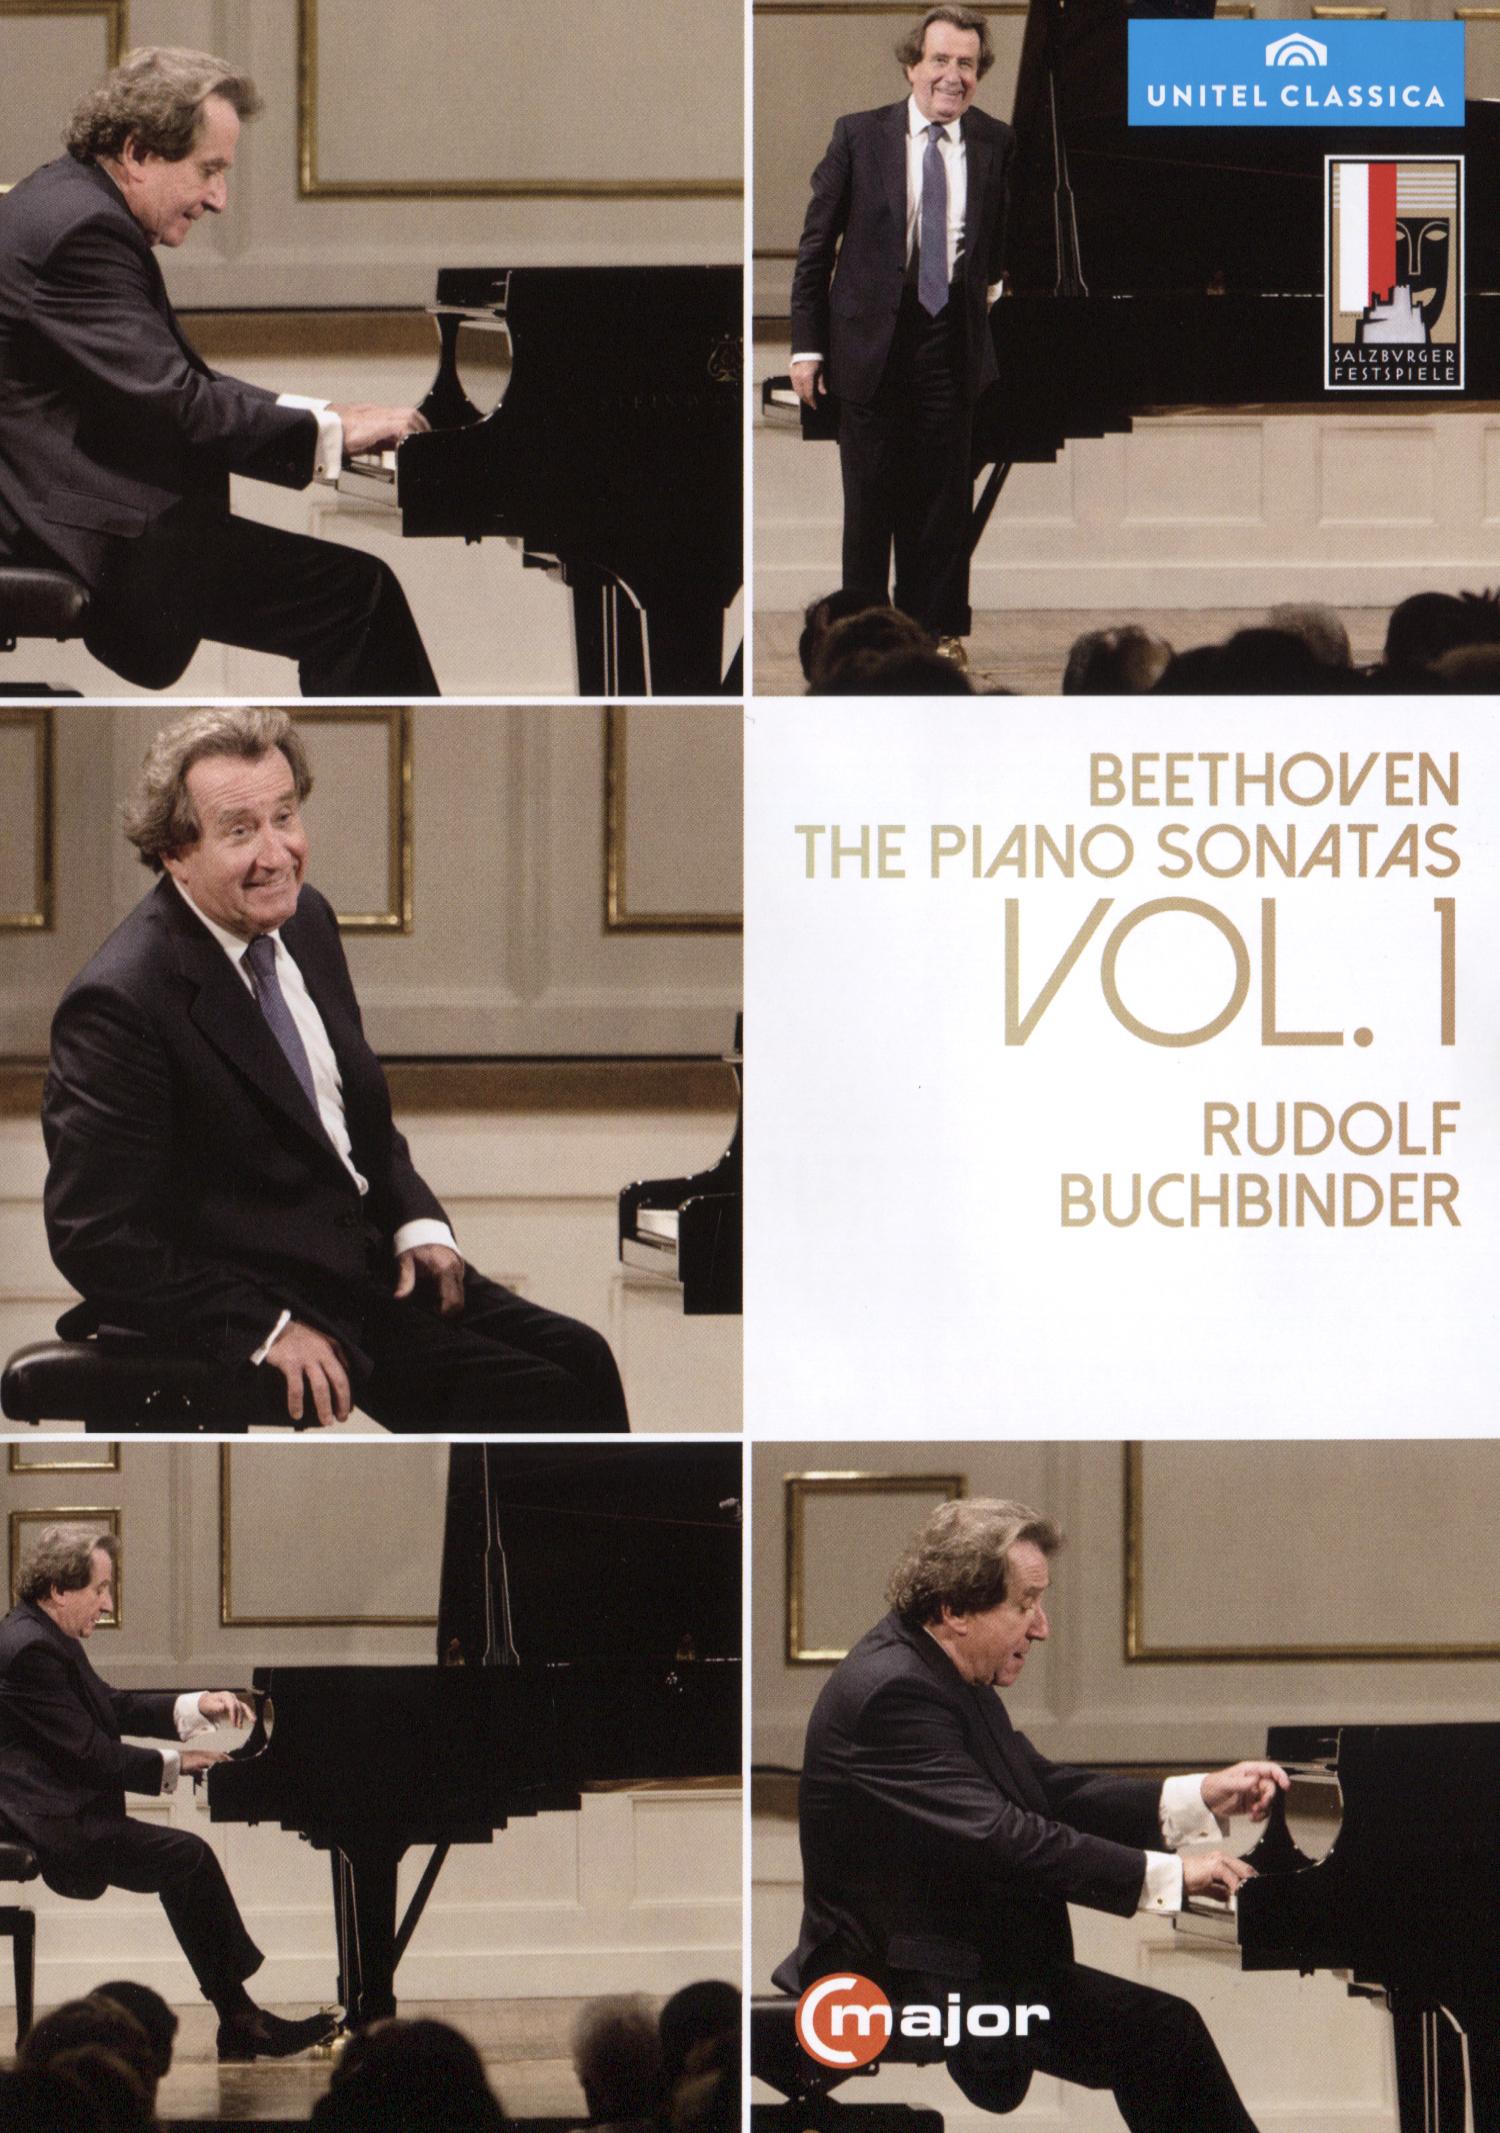 Rudolf Buchbinder: Beethoven - The Piano Sonatas Vol. 1 [2 Discs] (dvd) 29837566